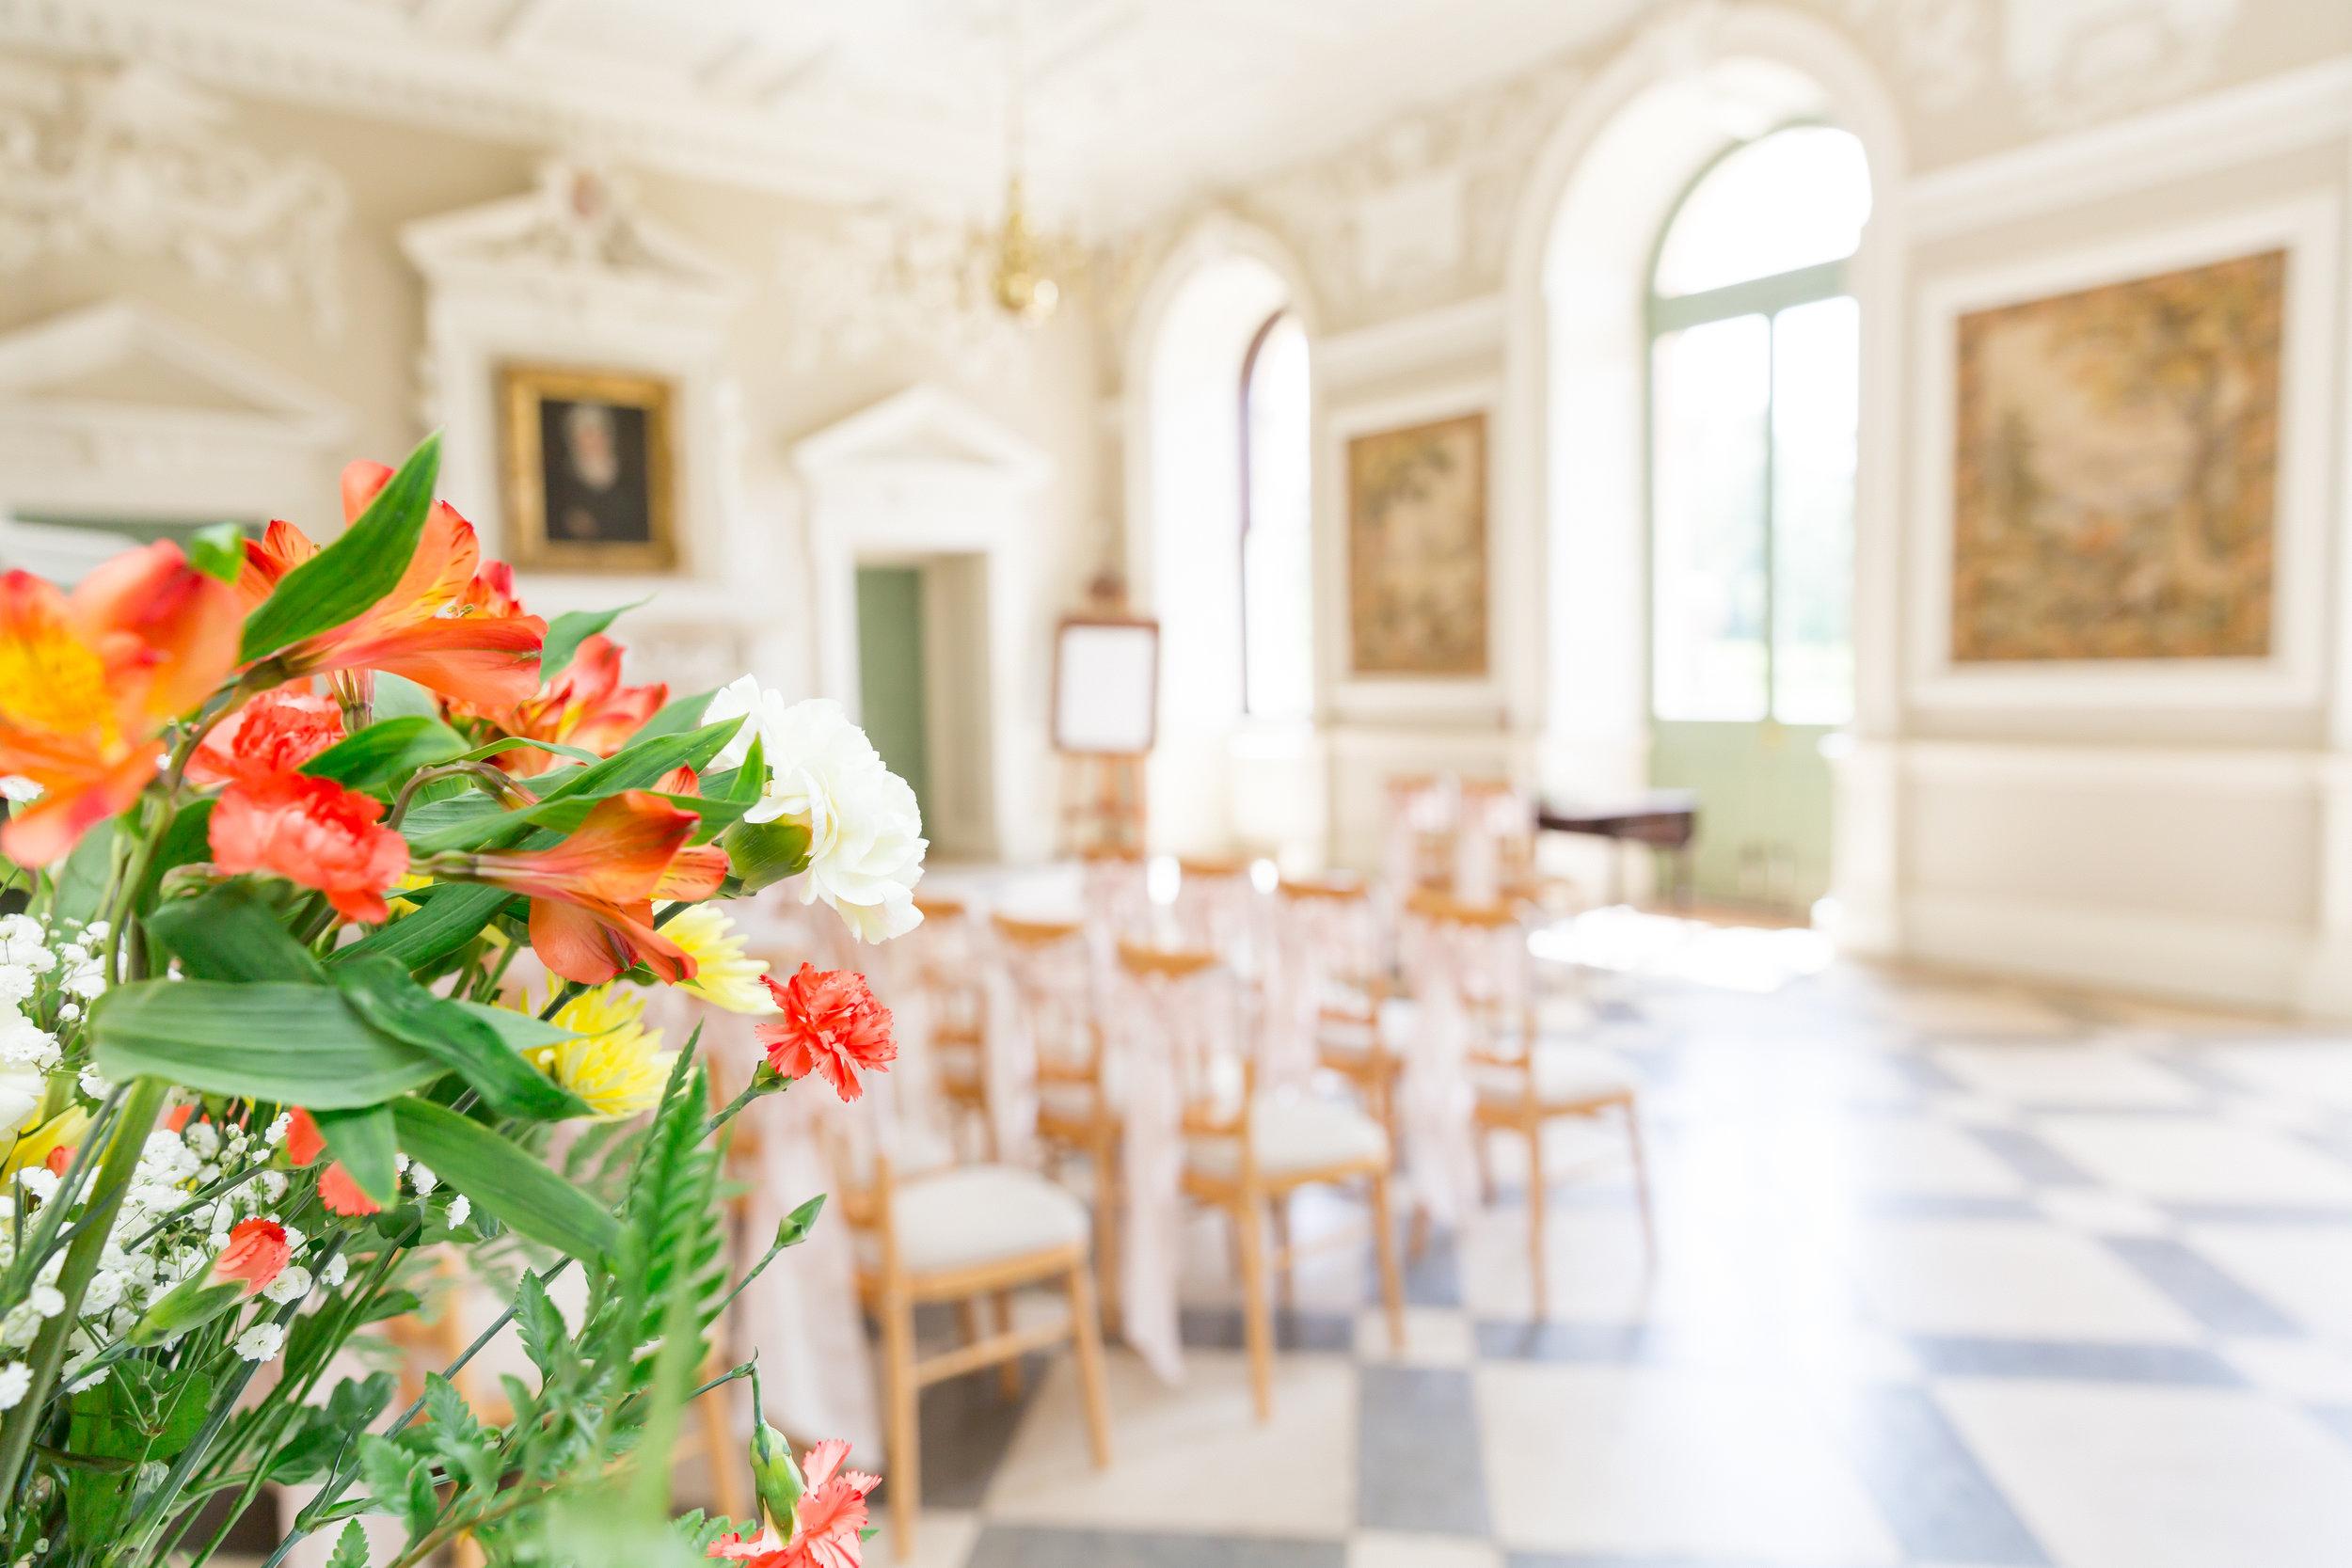 crowcombe court wedding.jpg